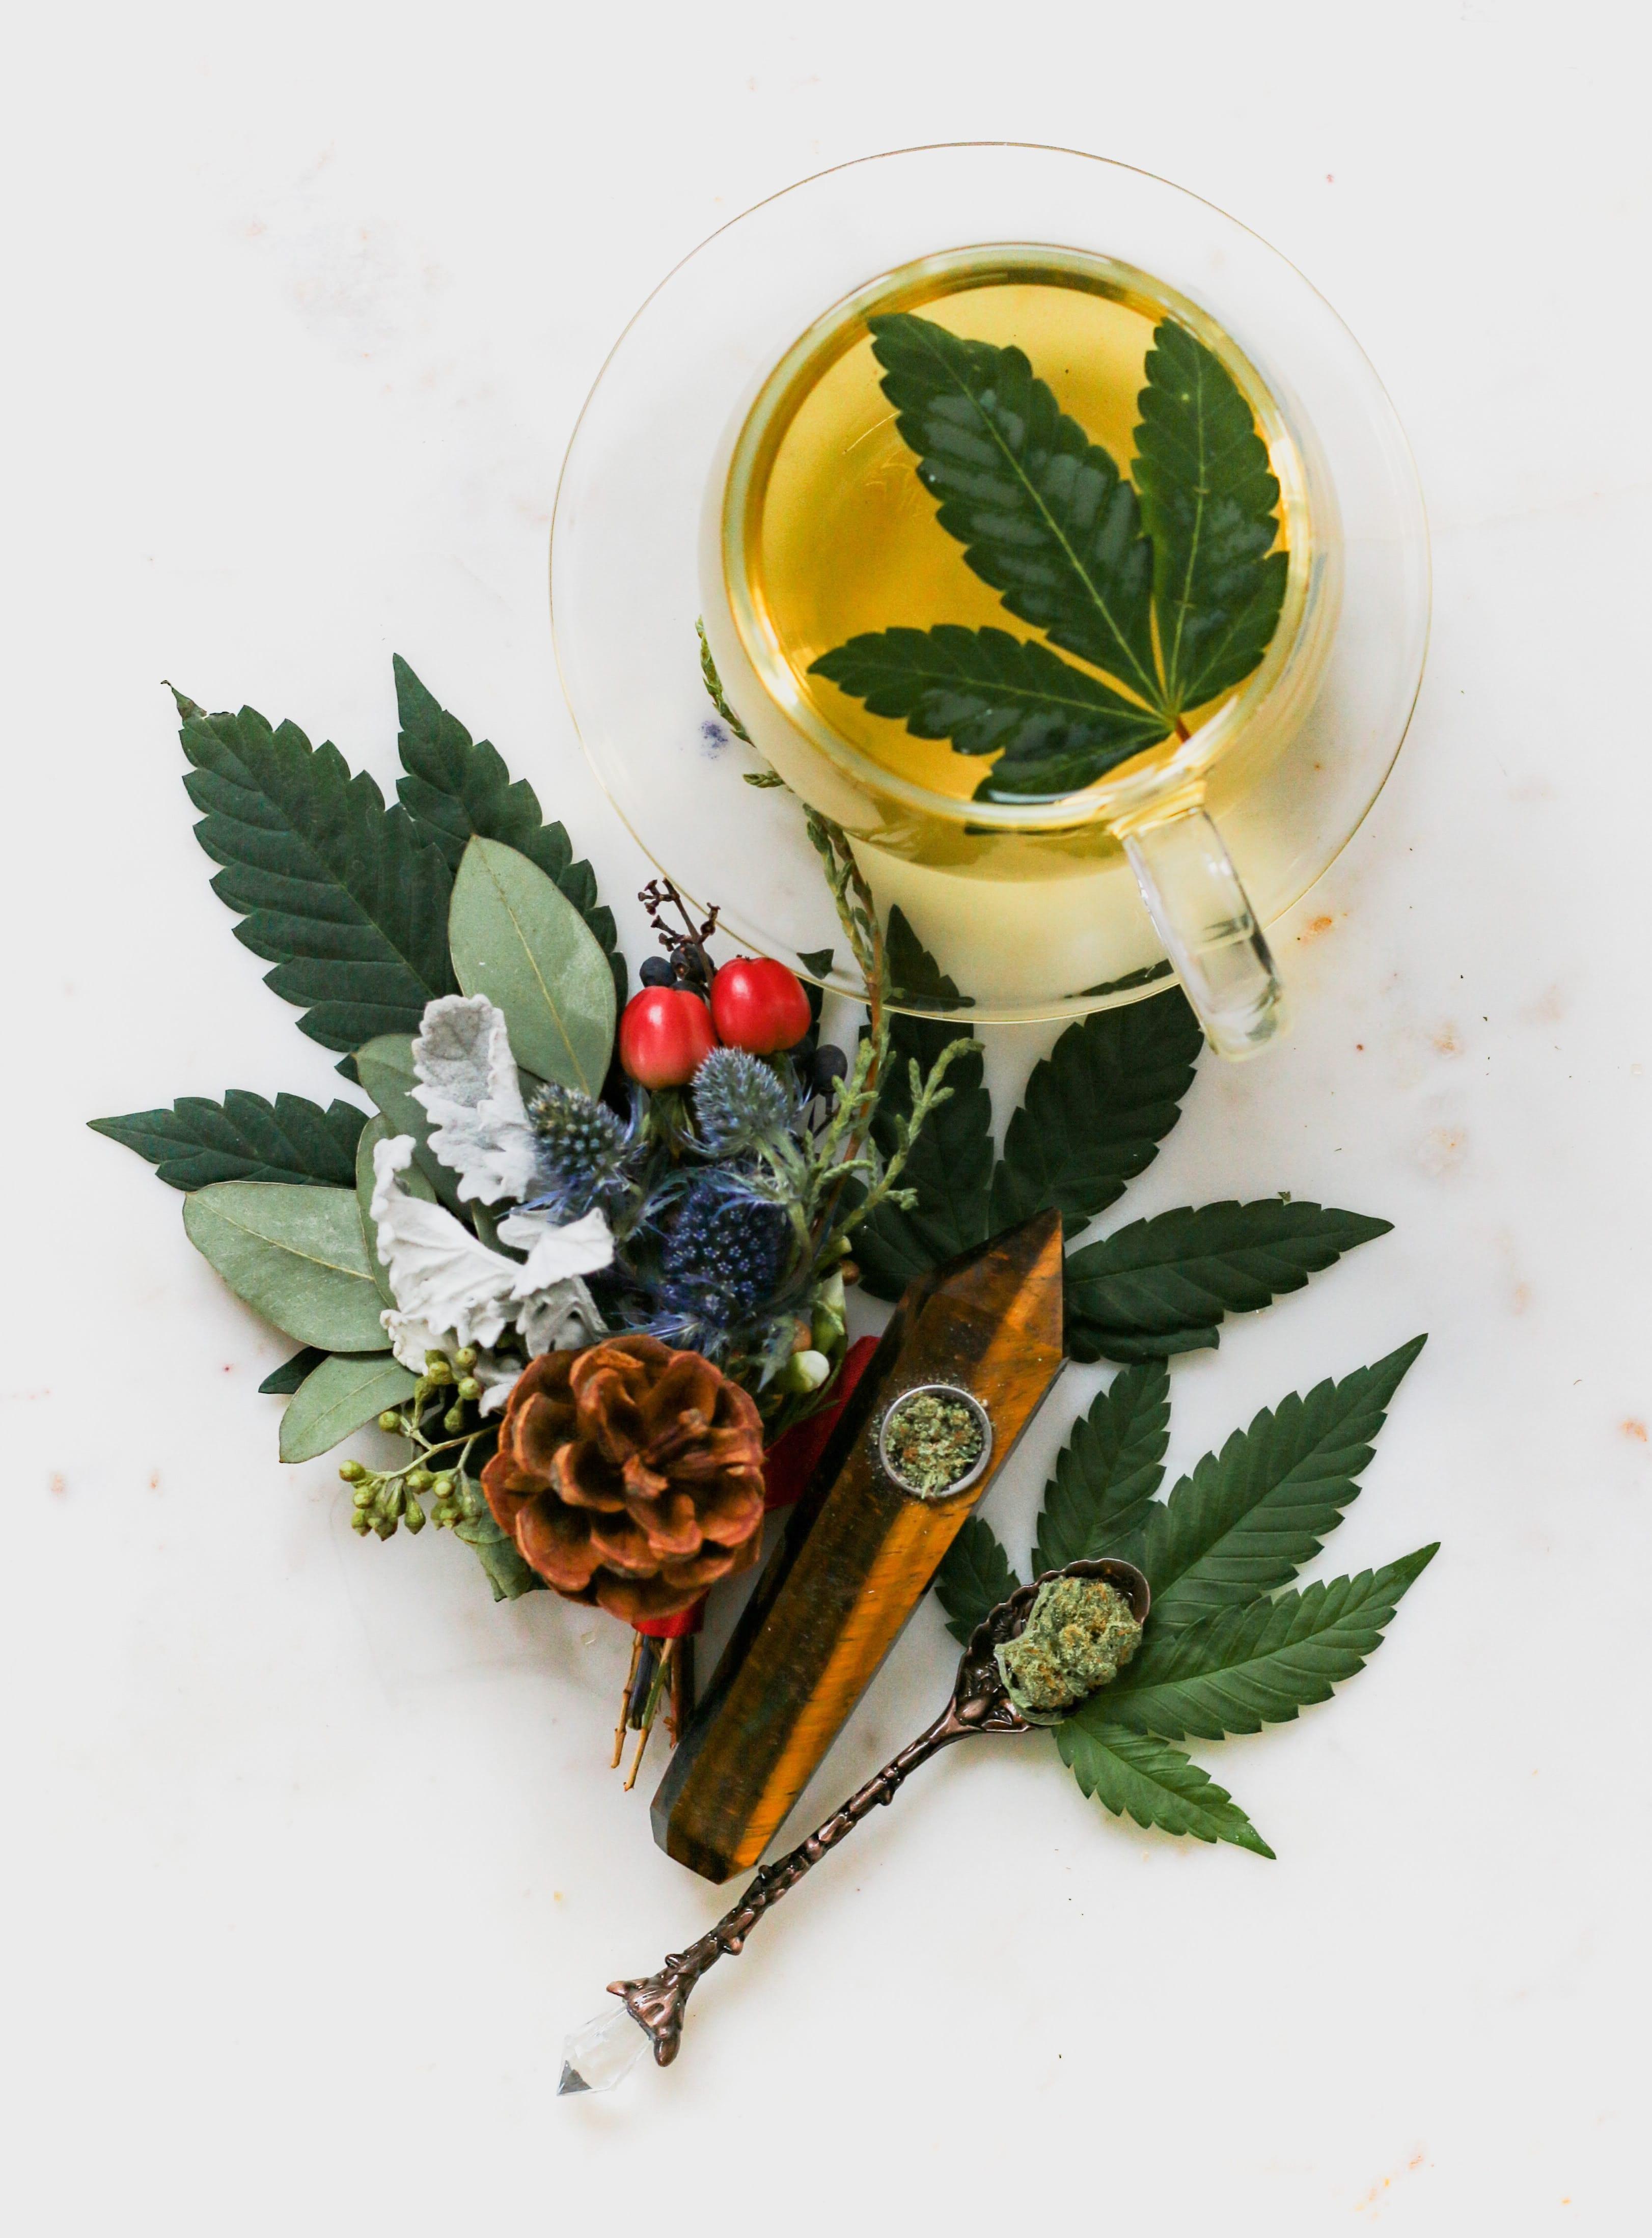 Marijuana tea with various herbs; image by Kimzy Nanney, via Unsplash.com.